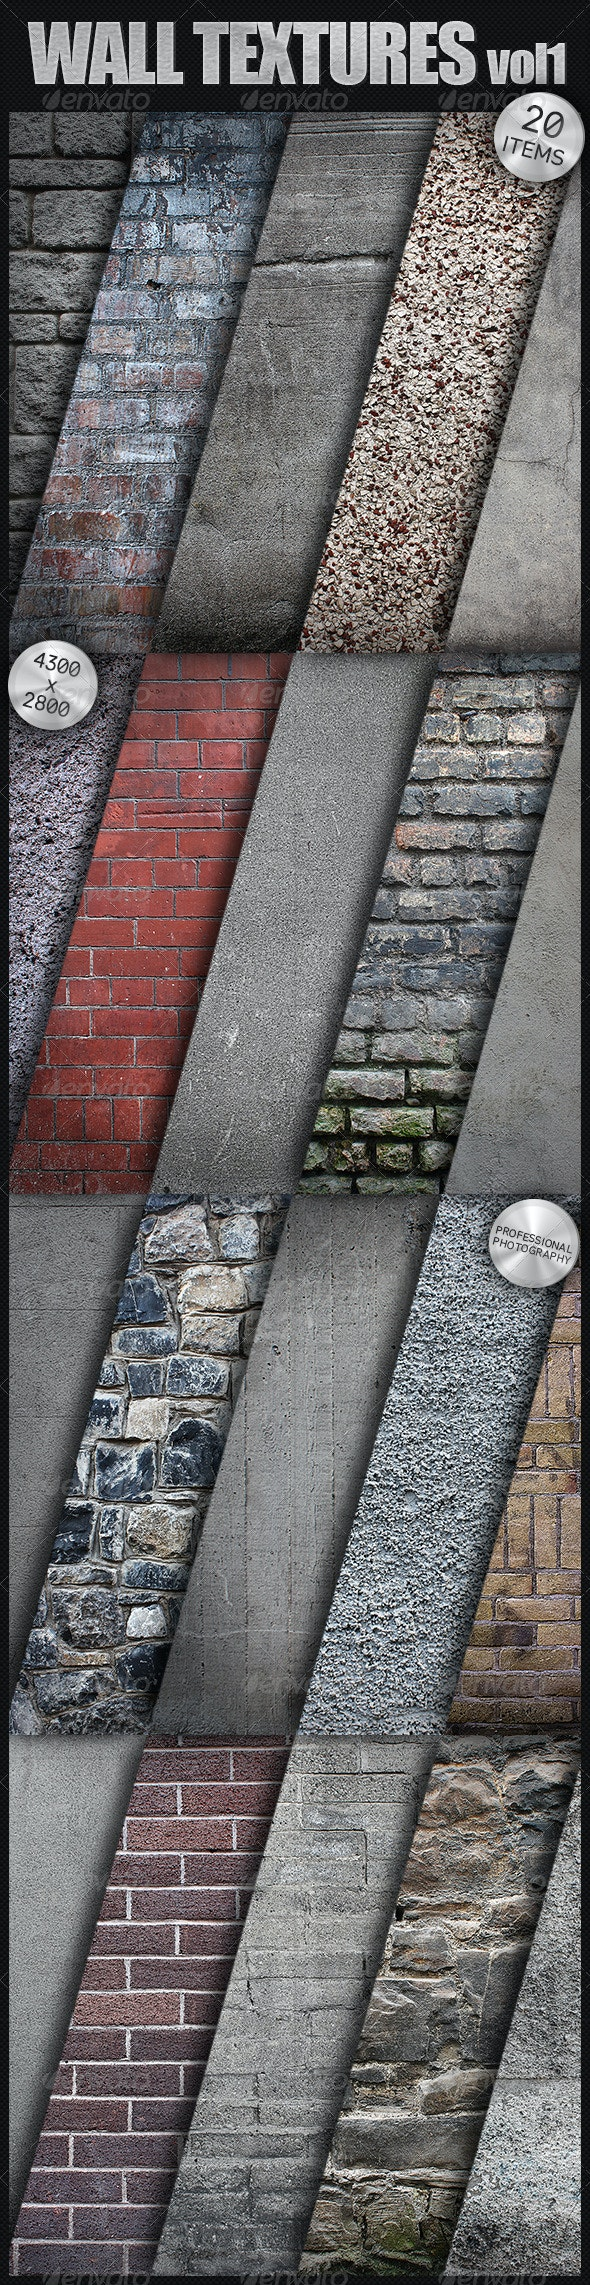 Wall Textures Collection - Brick & Concrete - Stone Textures